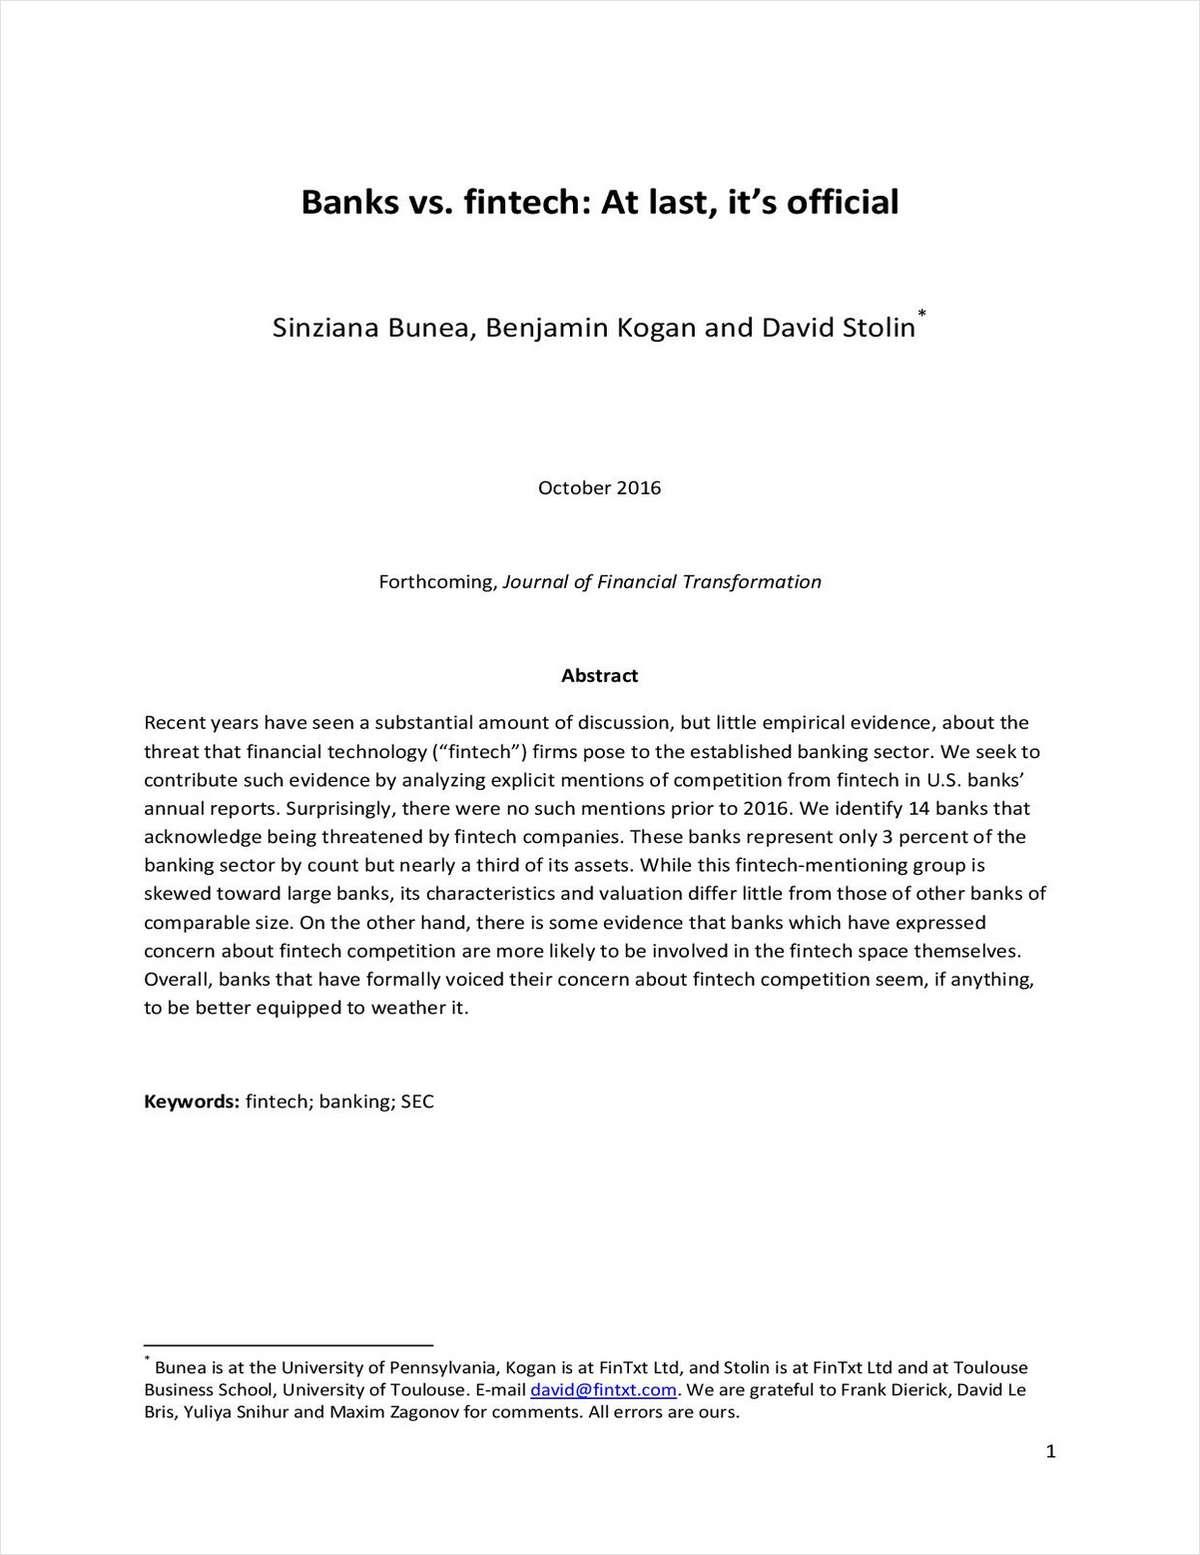 Banks vs. fintech: At last, it's official